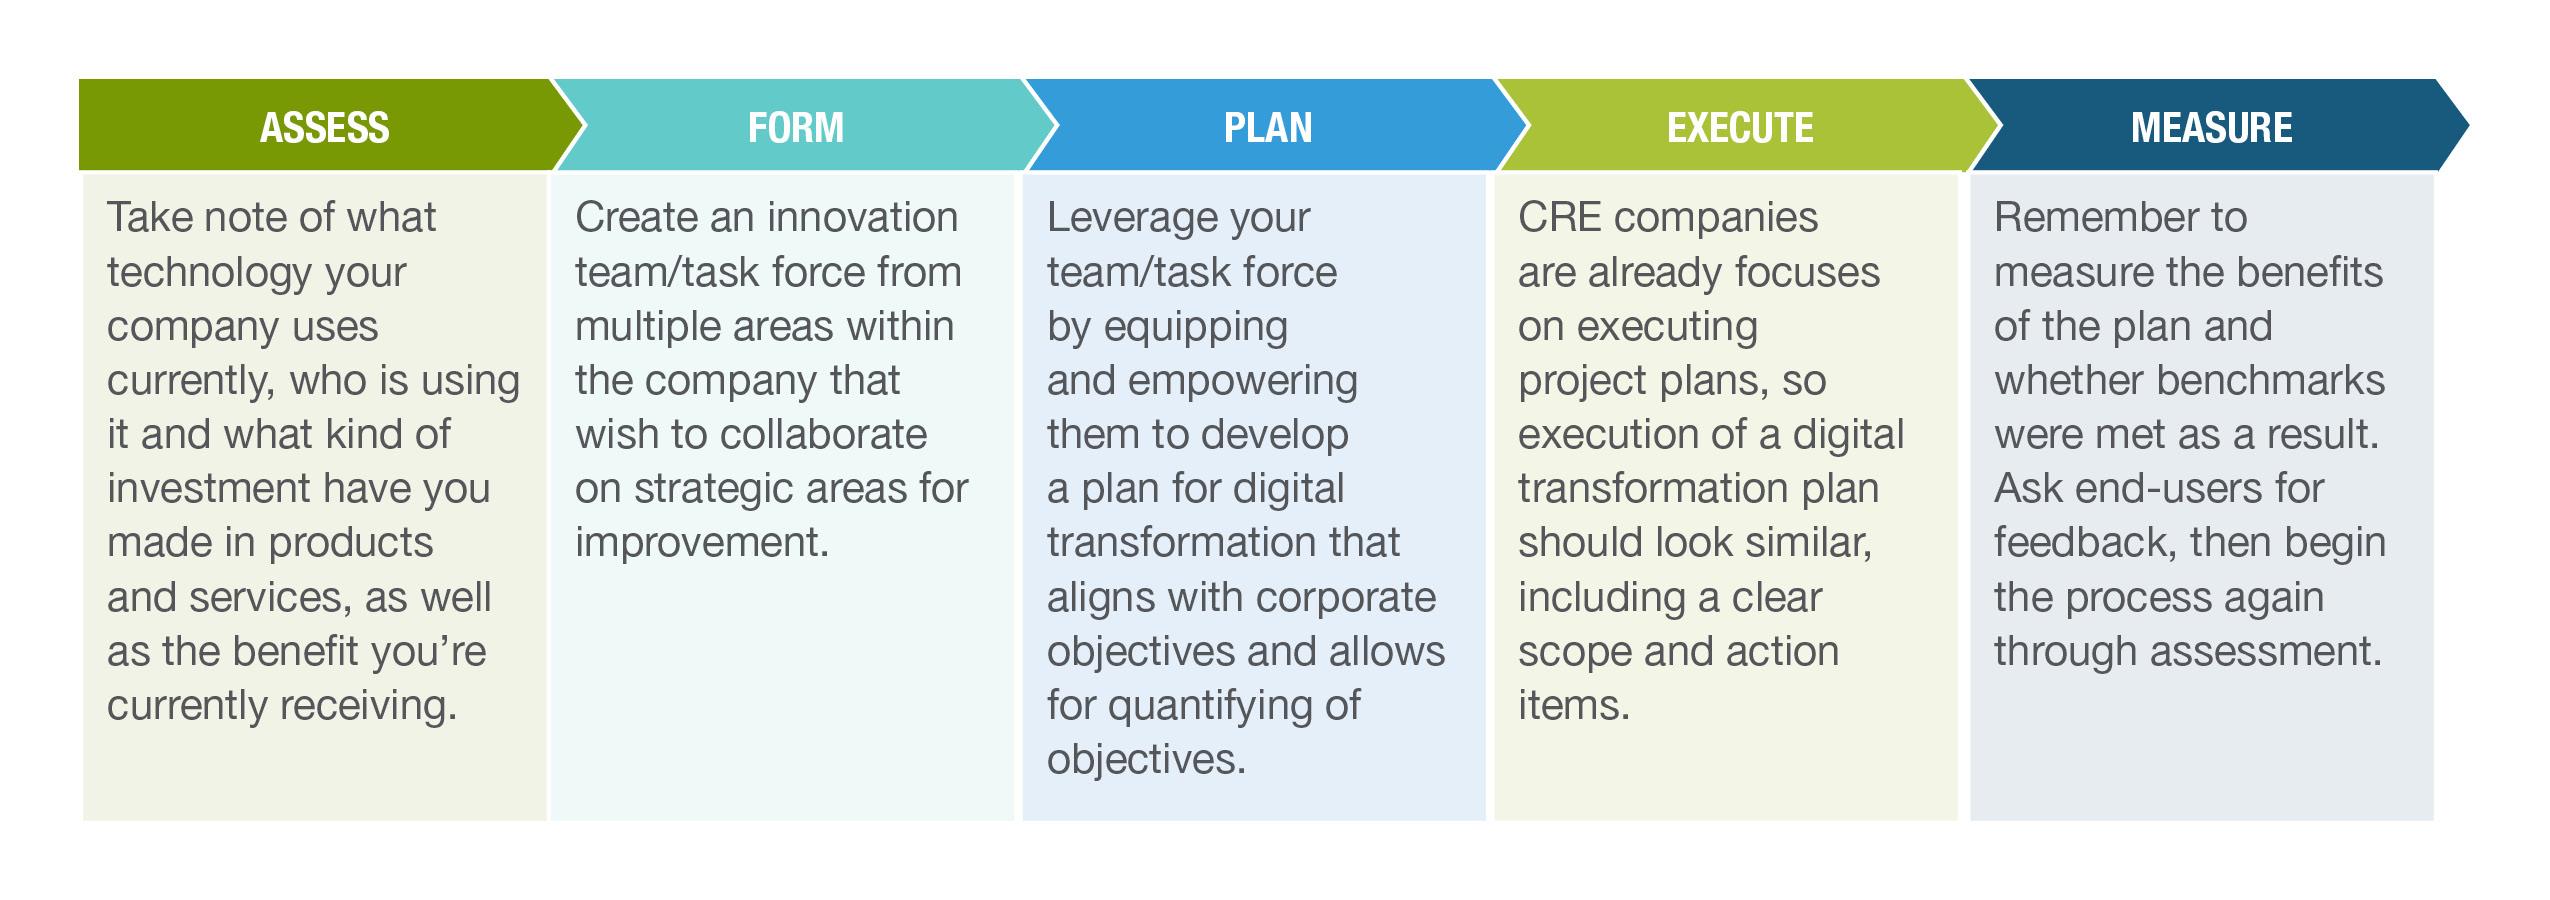 Roadmap-for-Digital-Transformation-Infographic-DHG-Views.jpg